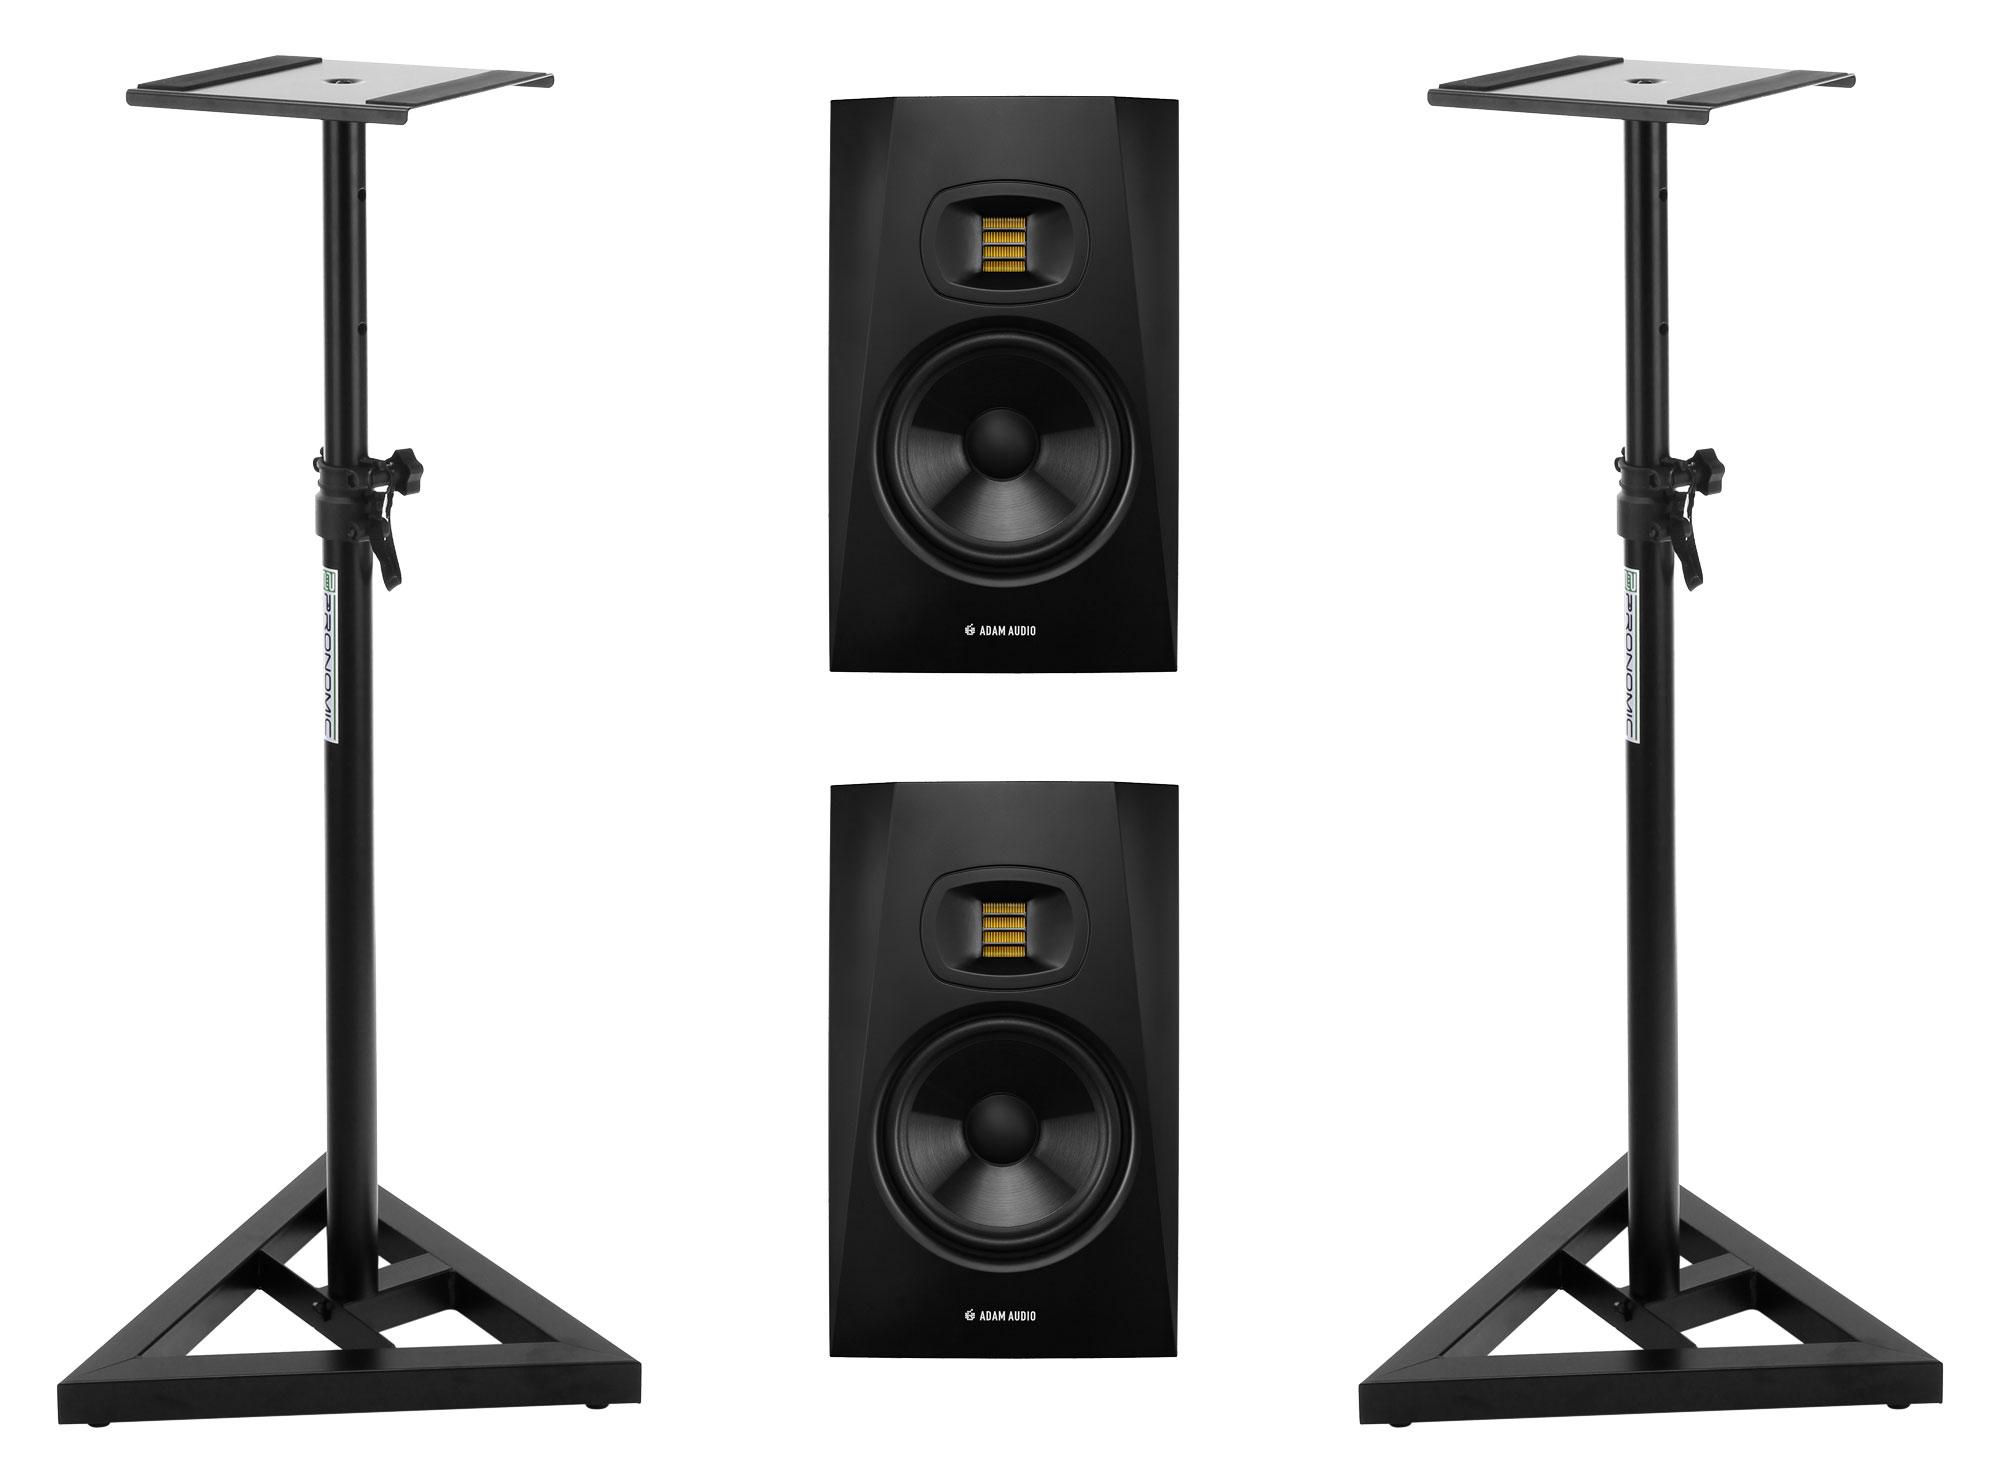 Studiomonitore - Adam Audio T7V Set inkl. Boxenstative - Onlineshop Musikhaus Kirstein